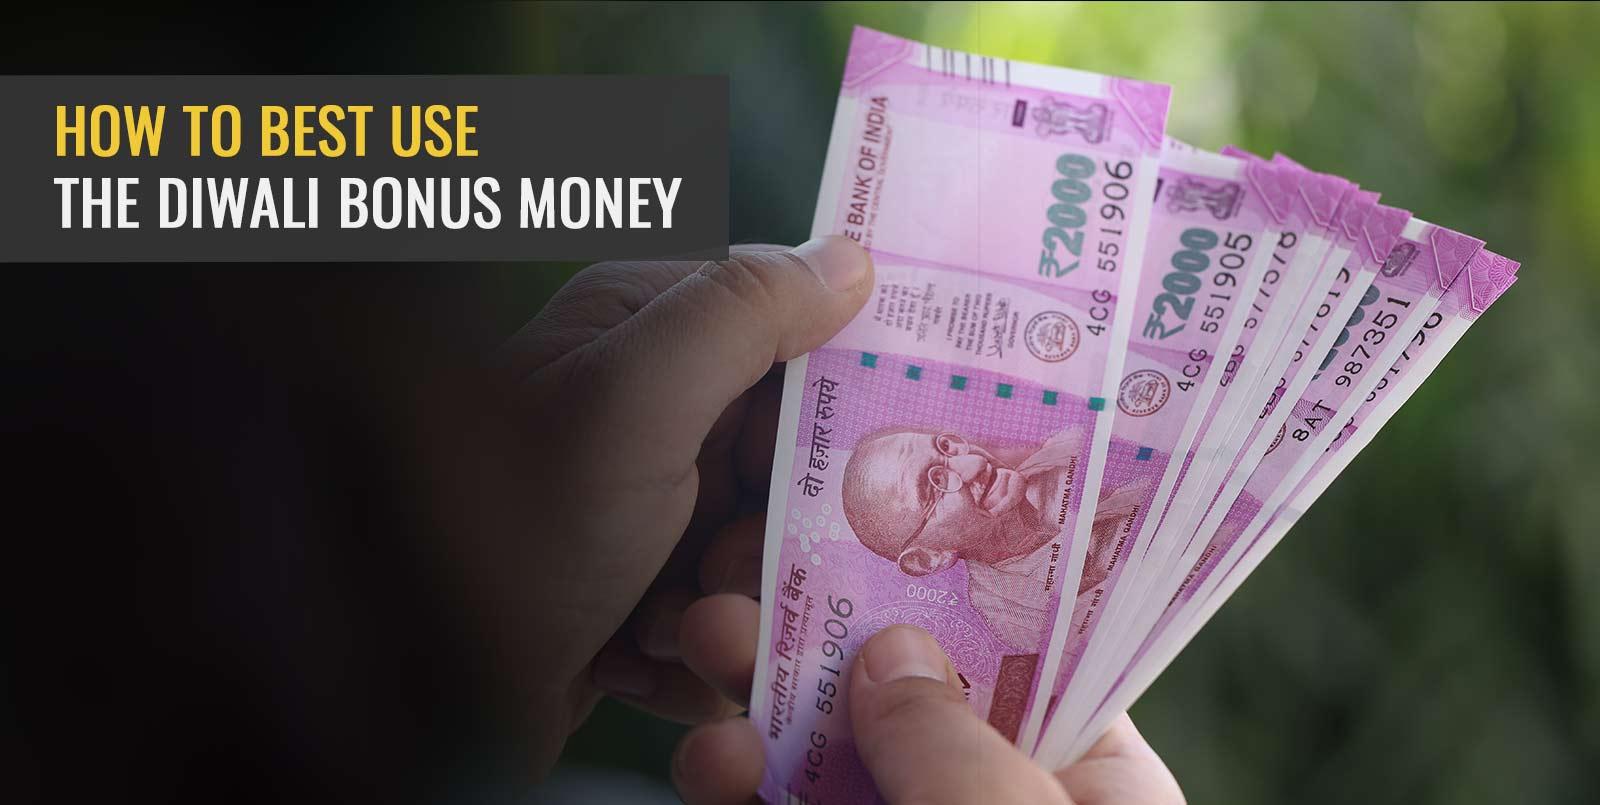 How To Best Use The Diwali Bonus Money